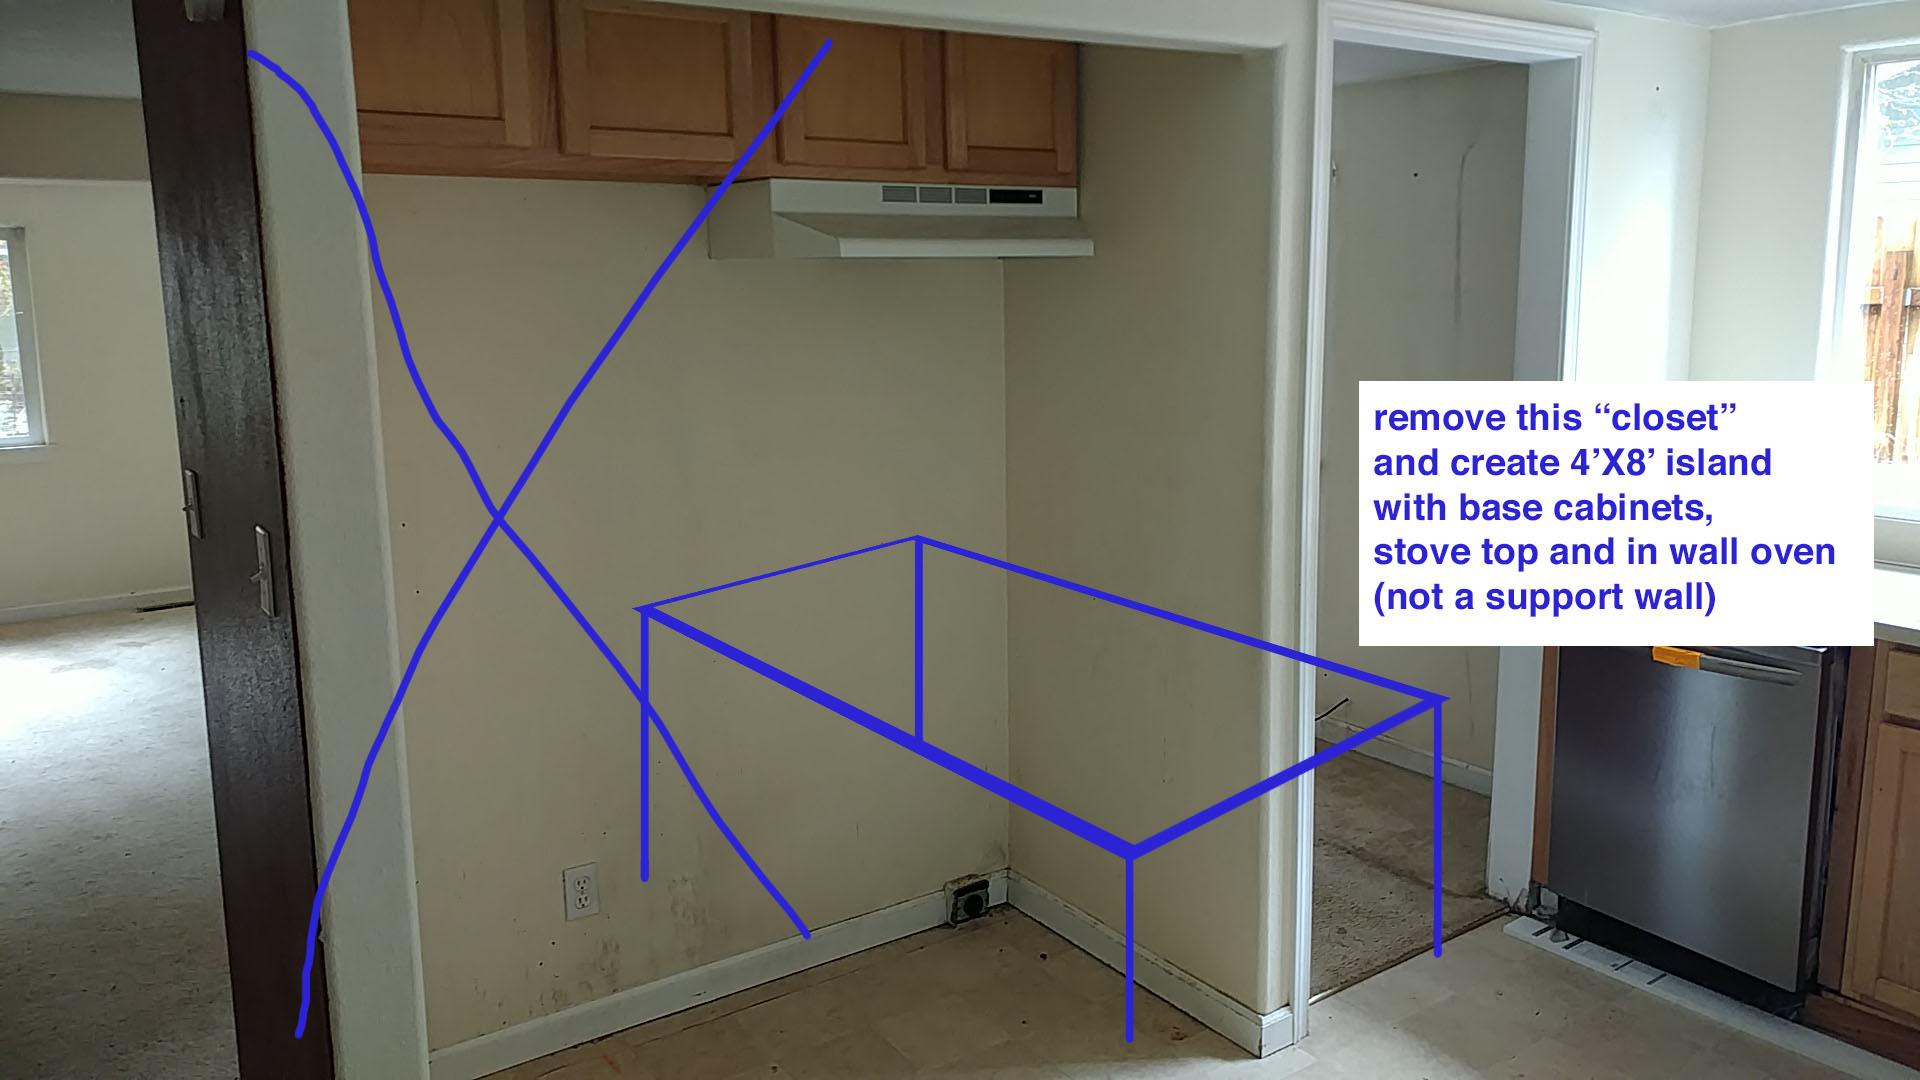 remove kitchen closet add island.jpg